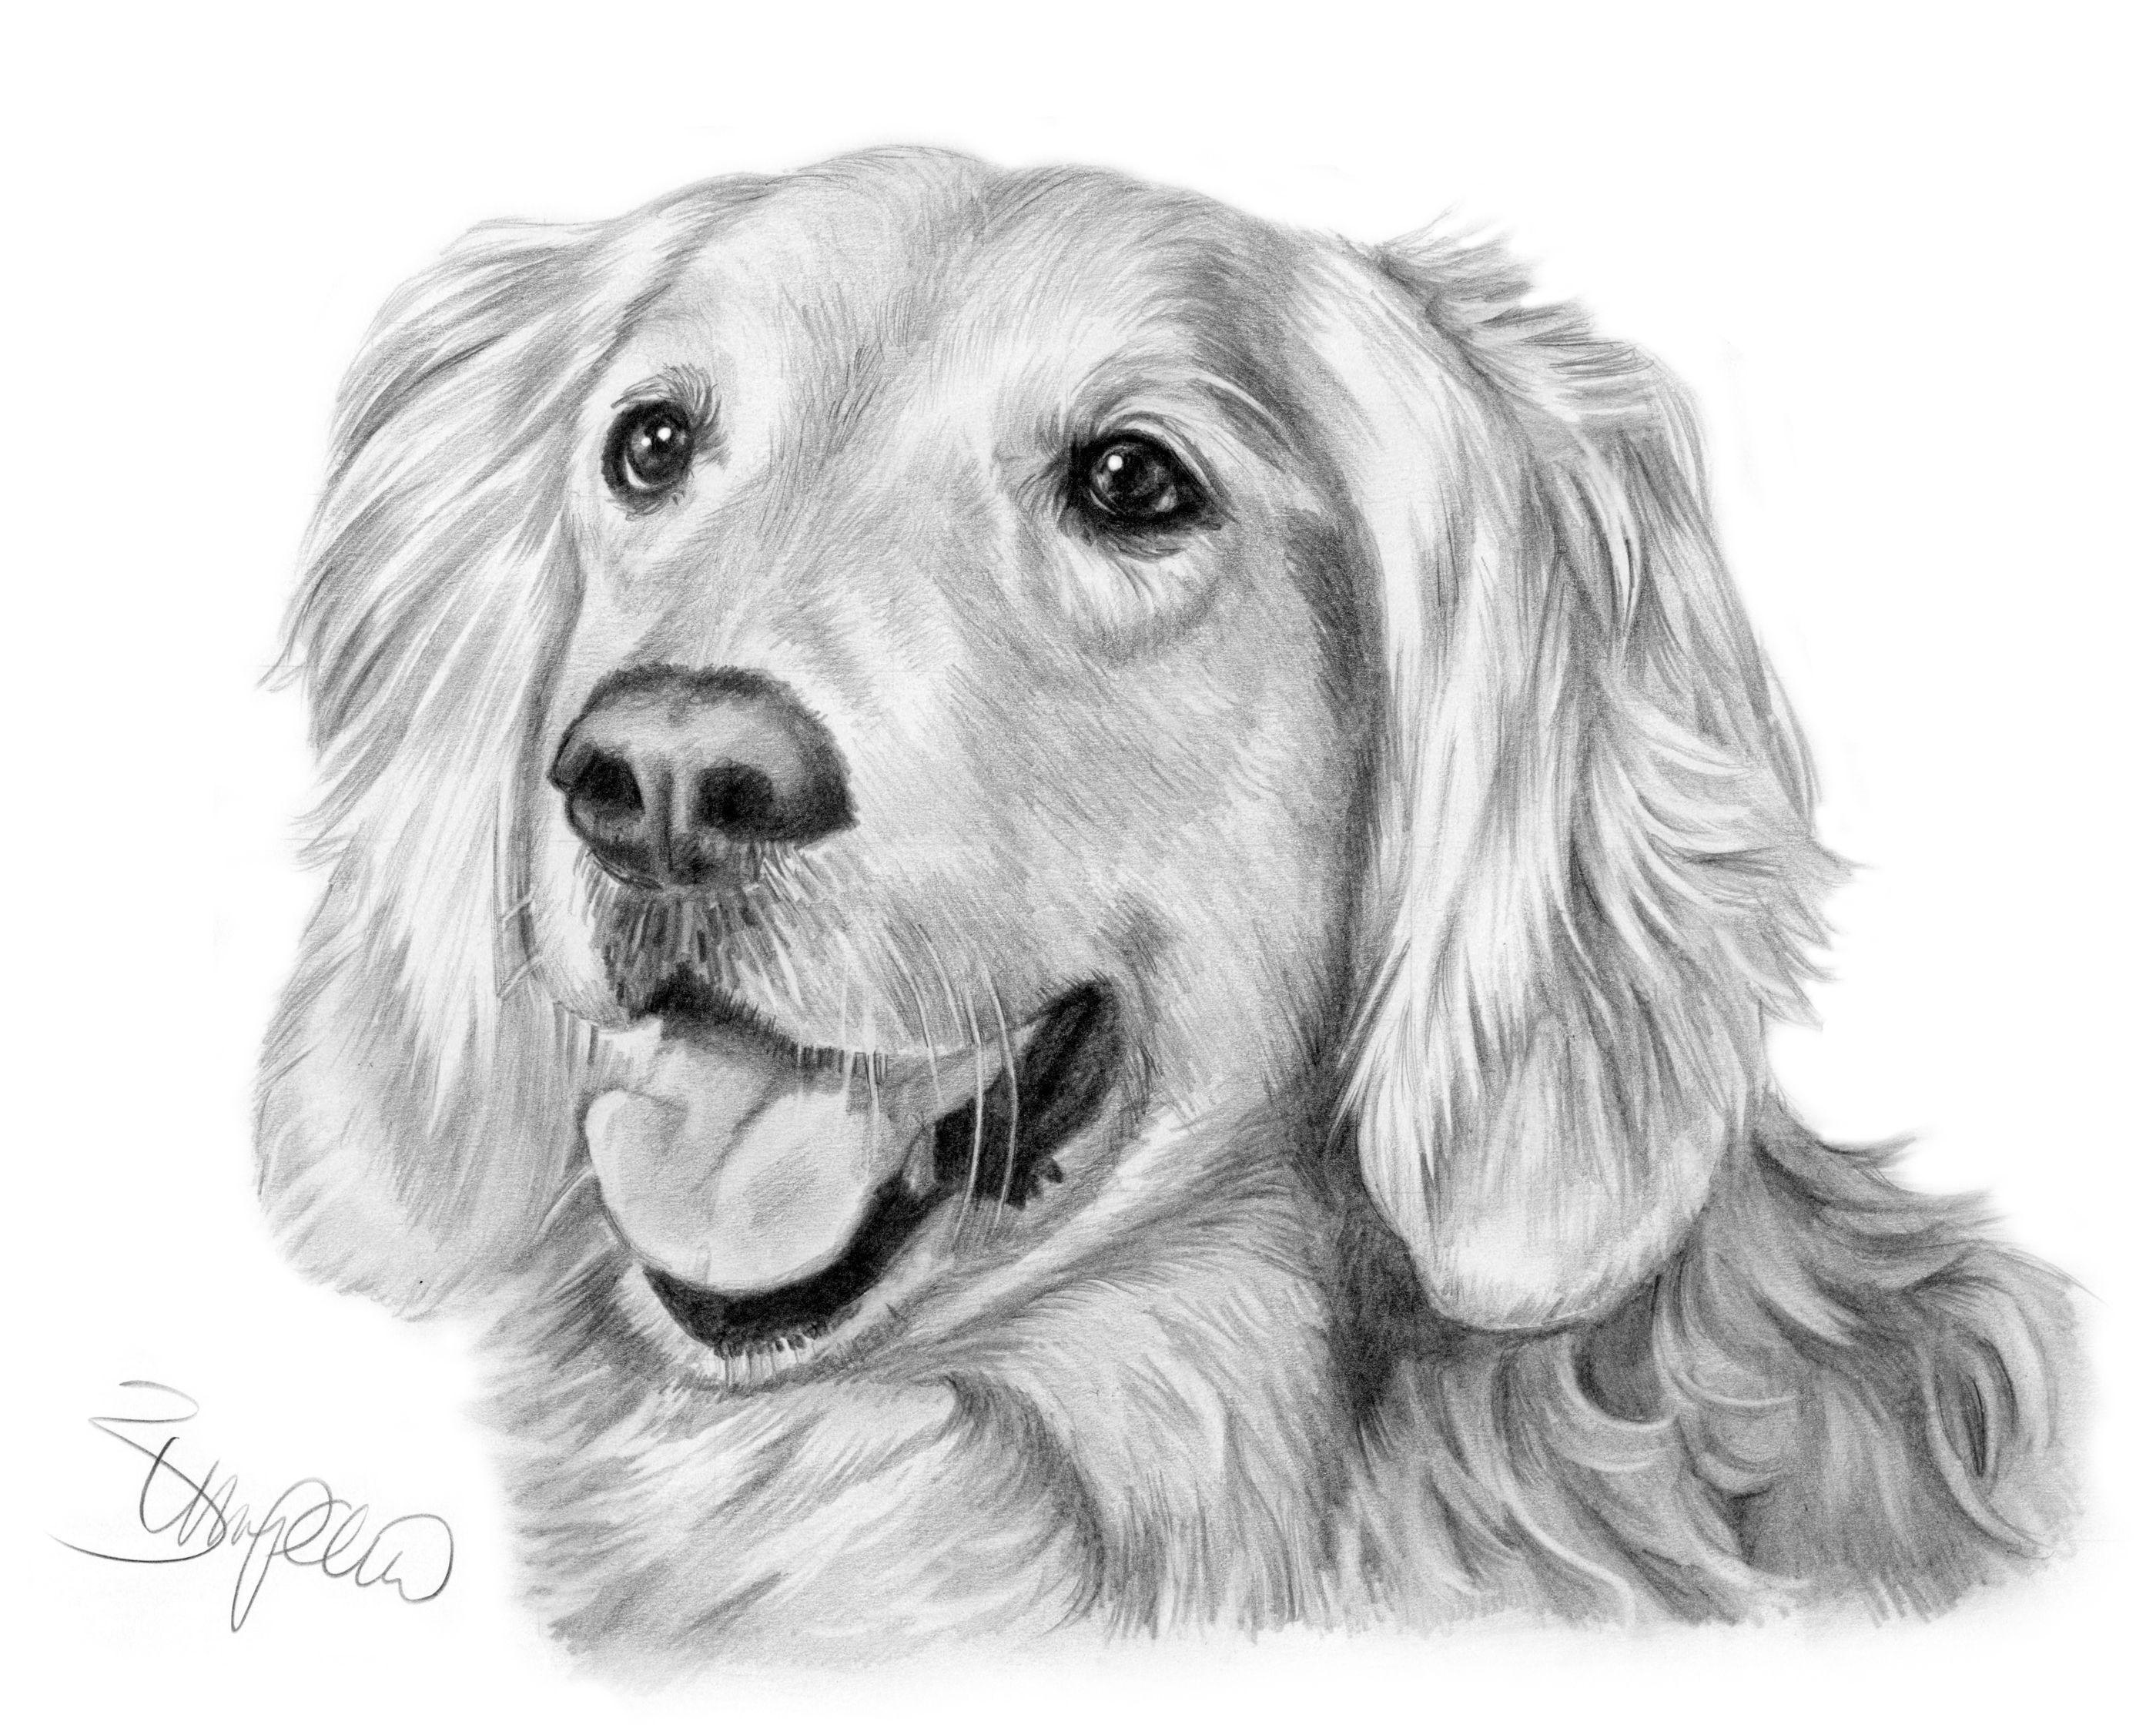 Pencil Portrait Of Golden Retriever Drawn By Wendy Zumpano Www Pencilportraitcards Com Golden Retriever Drawing Golden Retriever Art Dog Art